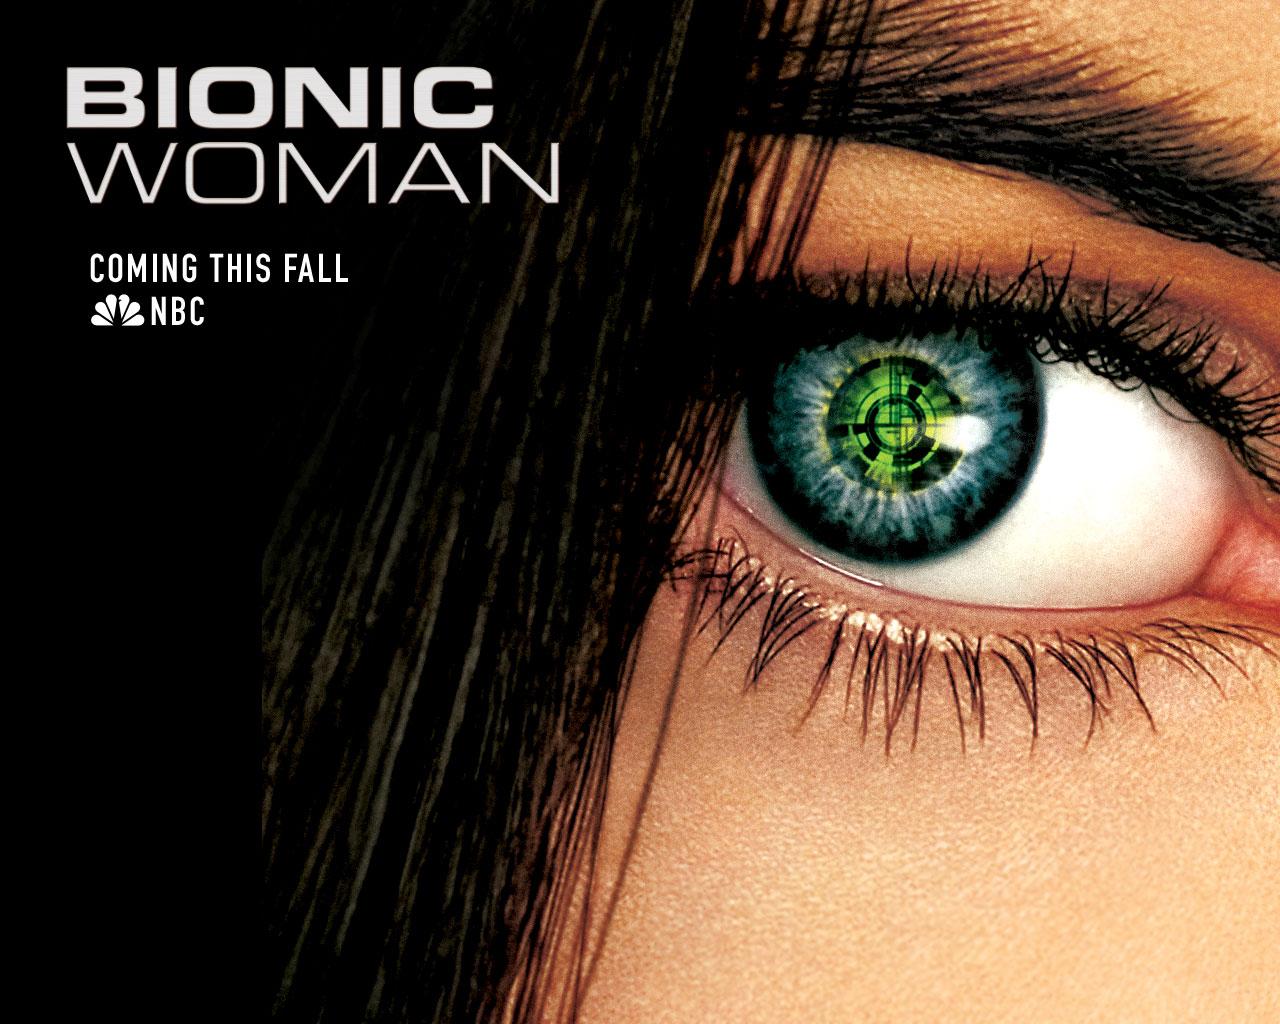 Bionic-Woman-bionic-woman-106810_1280_10